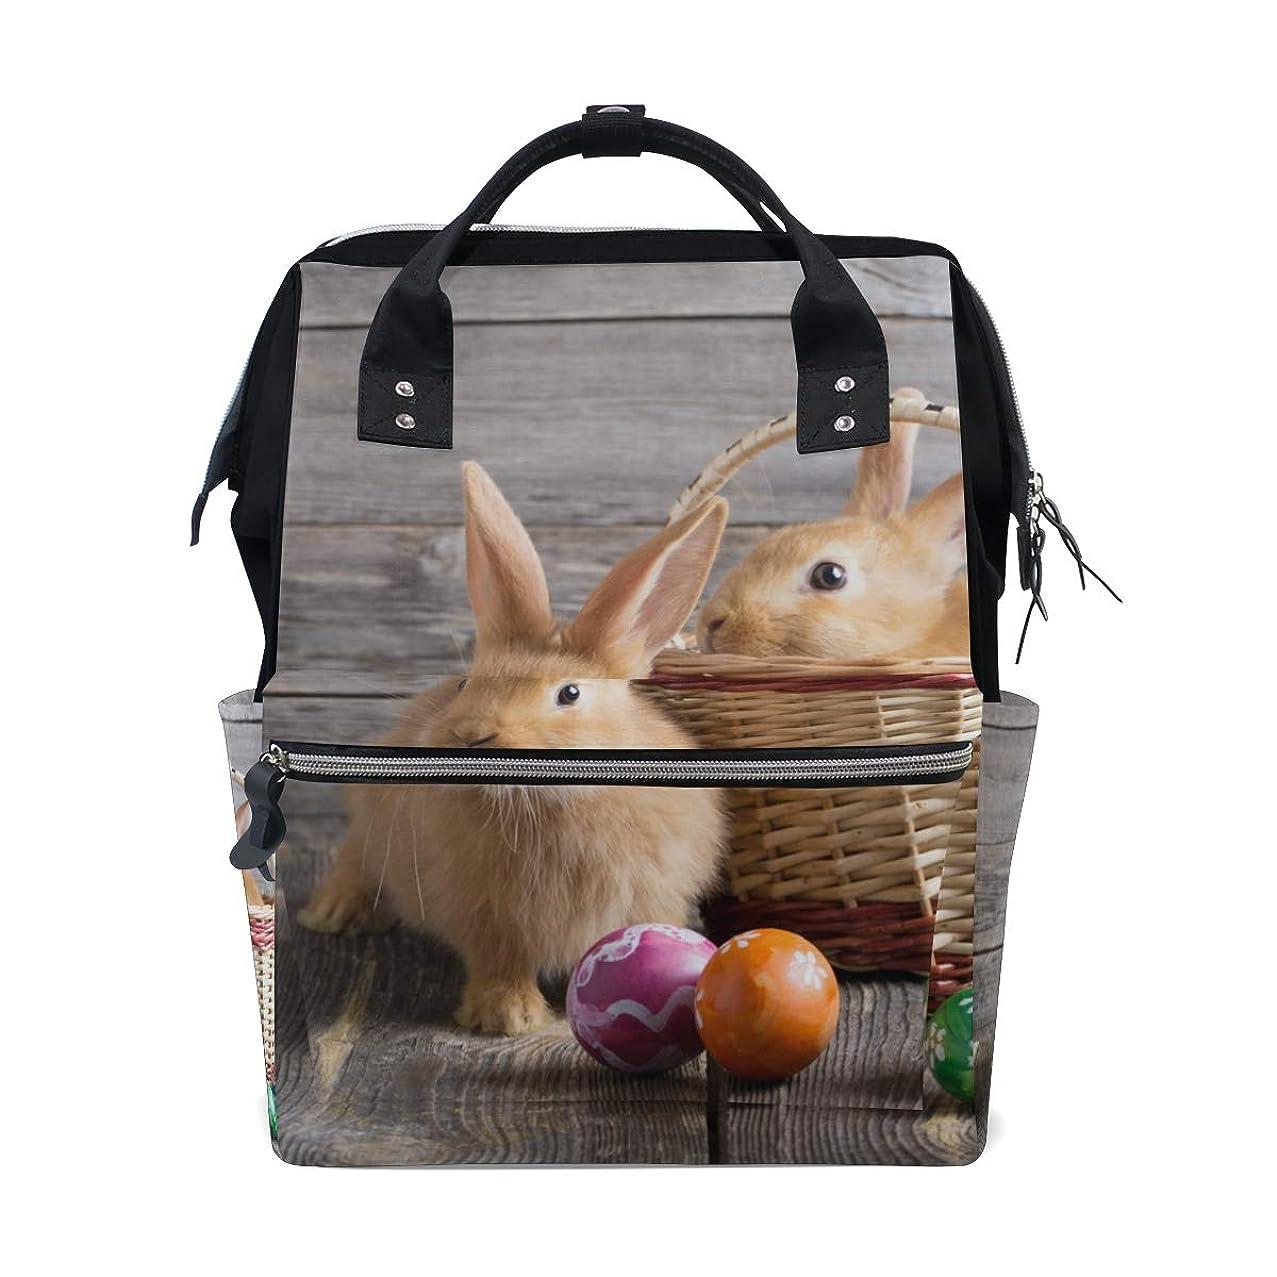 Rabbits Easter Eggs School Backpack Large Capacity Mummy Bags Laptop Handbag Casual Travel Rucksack Satchel For Women Men Adult Teen Children